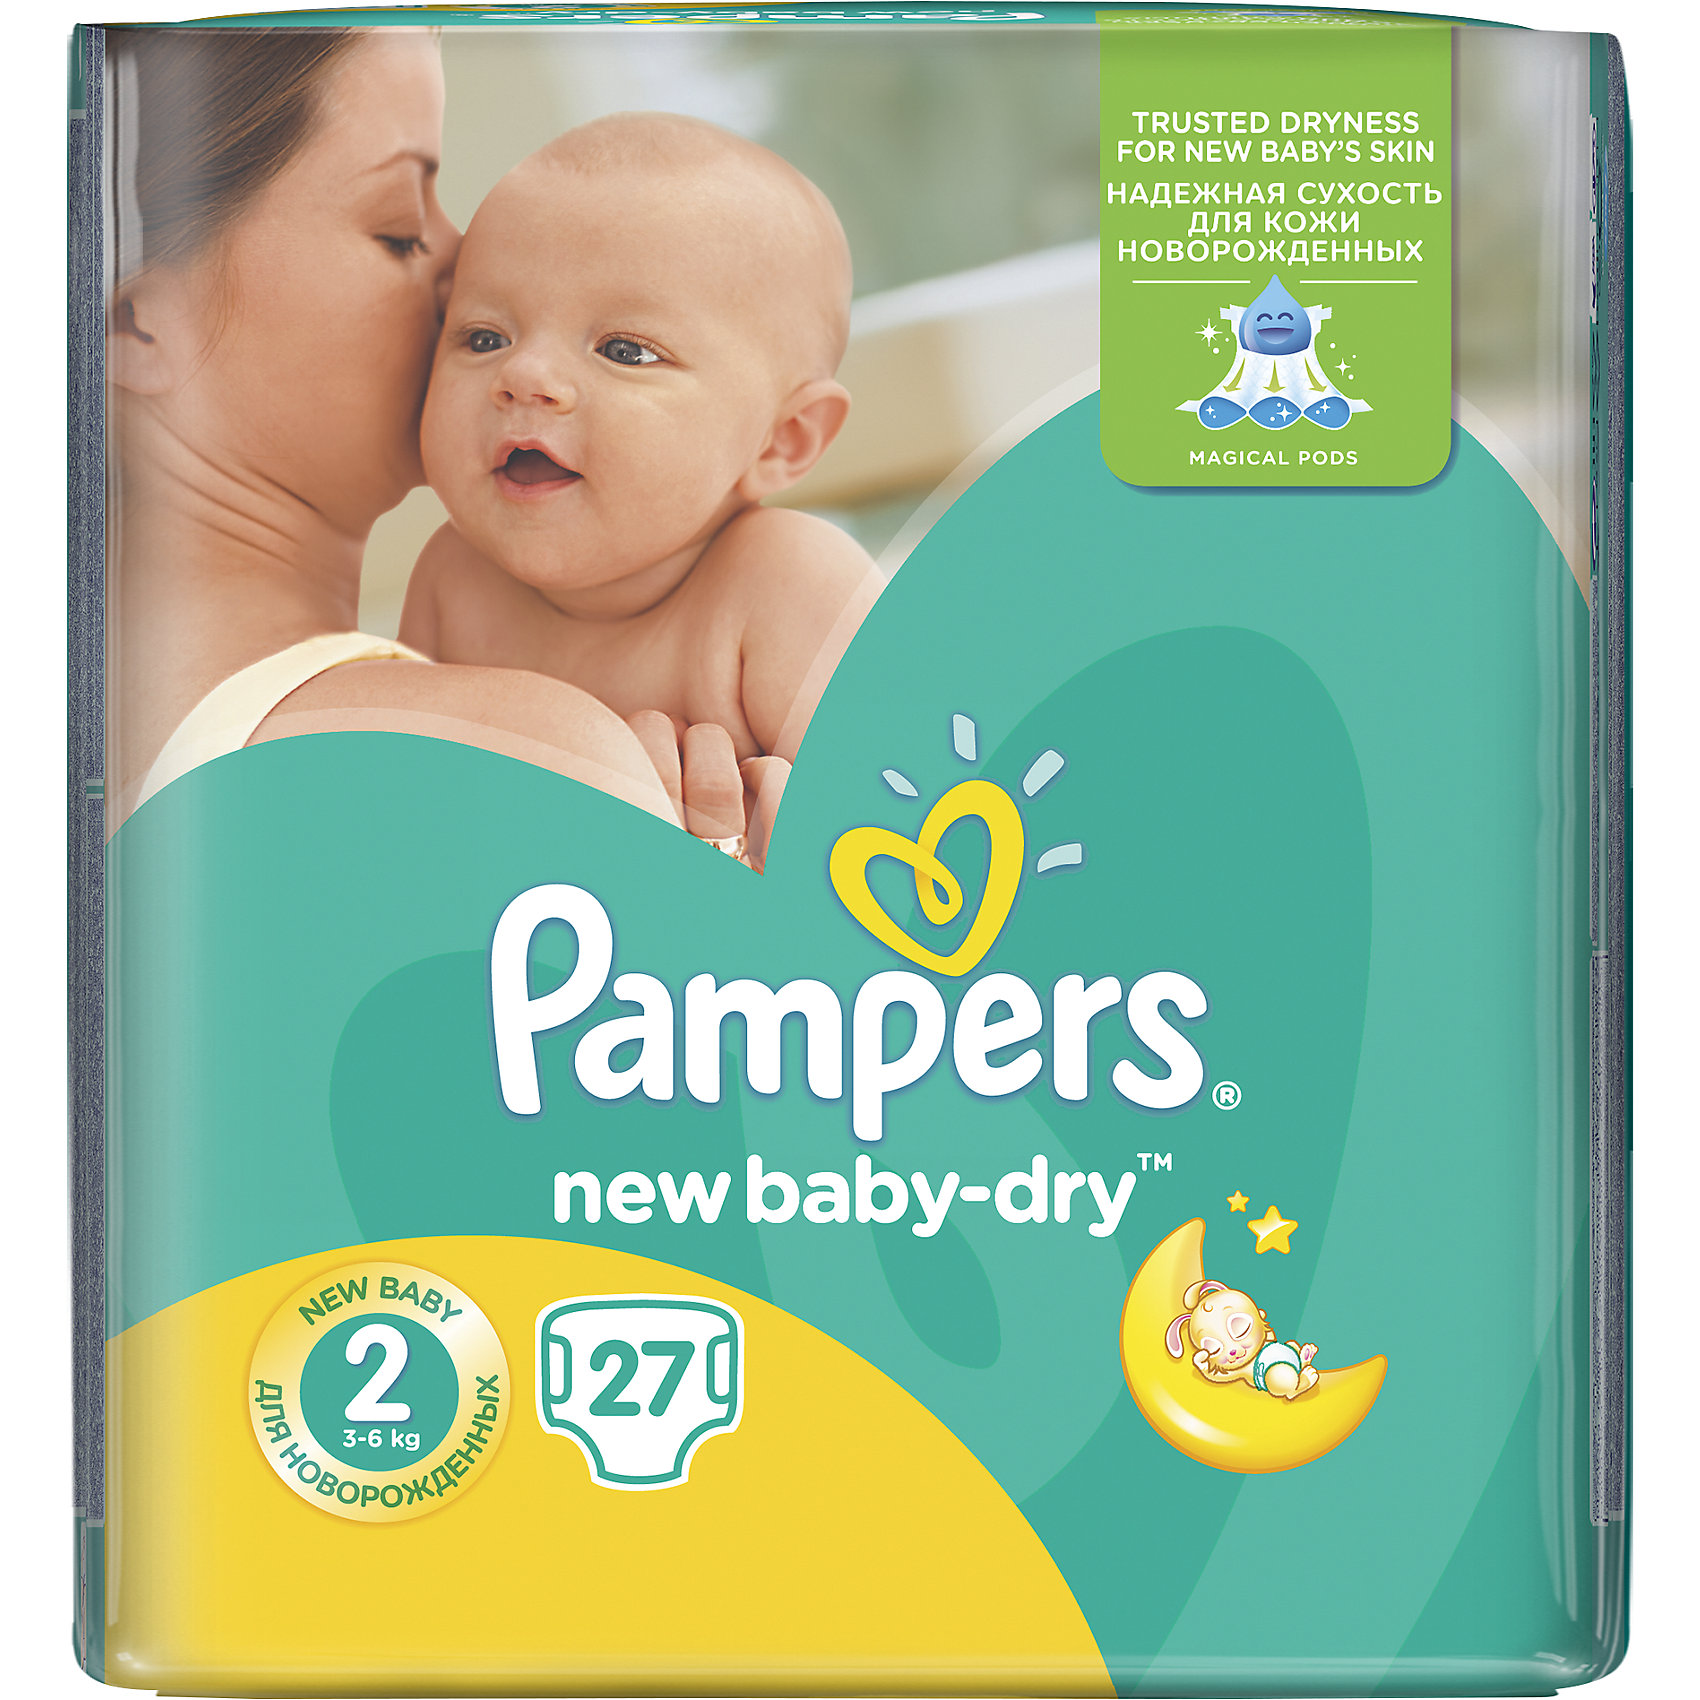 Подгузники Pampers New Baby-Dry Mini, 3-6 кг, 2 размер, 27 шт., Pampers<br><br>Ширина мм: 206<br>Глубина мм: 114<br>Высота мм: 188<br>Вес г: 597<br>Возраст от месяцев: 1<br>Возраст до месяцев: 3<br>Пол: Унисекс<br>Возраст: Детский<br>SKU: 5516302